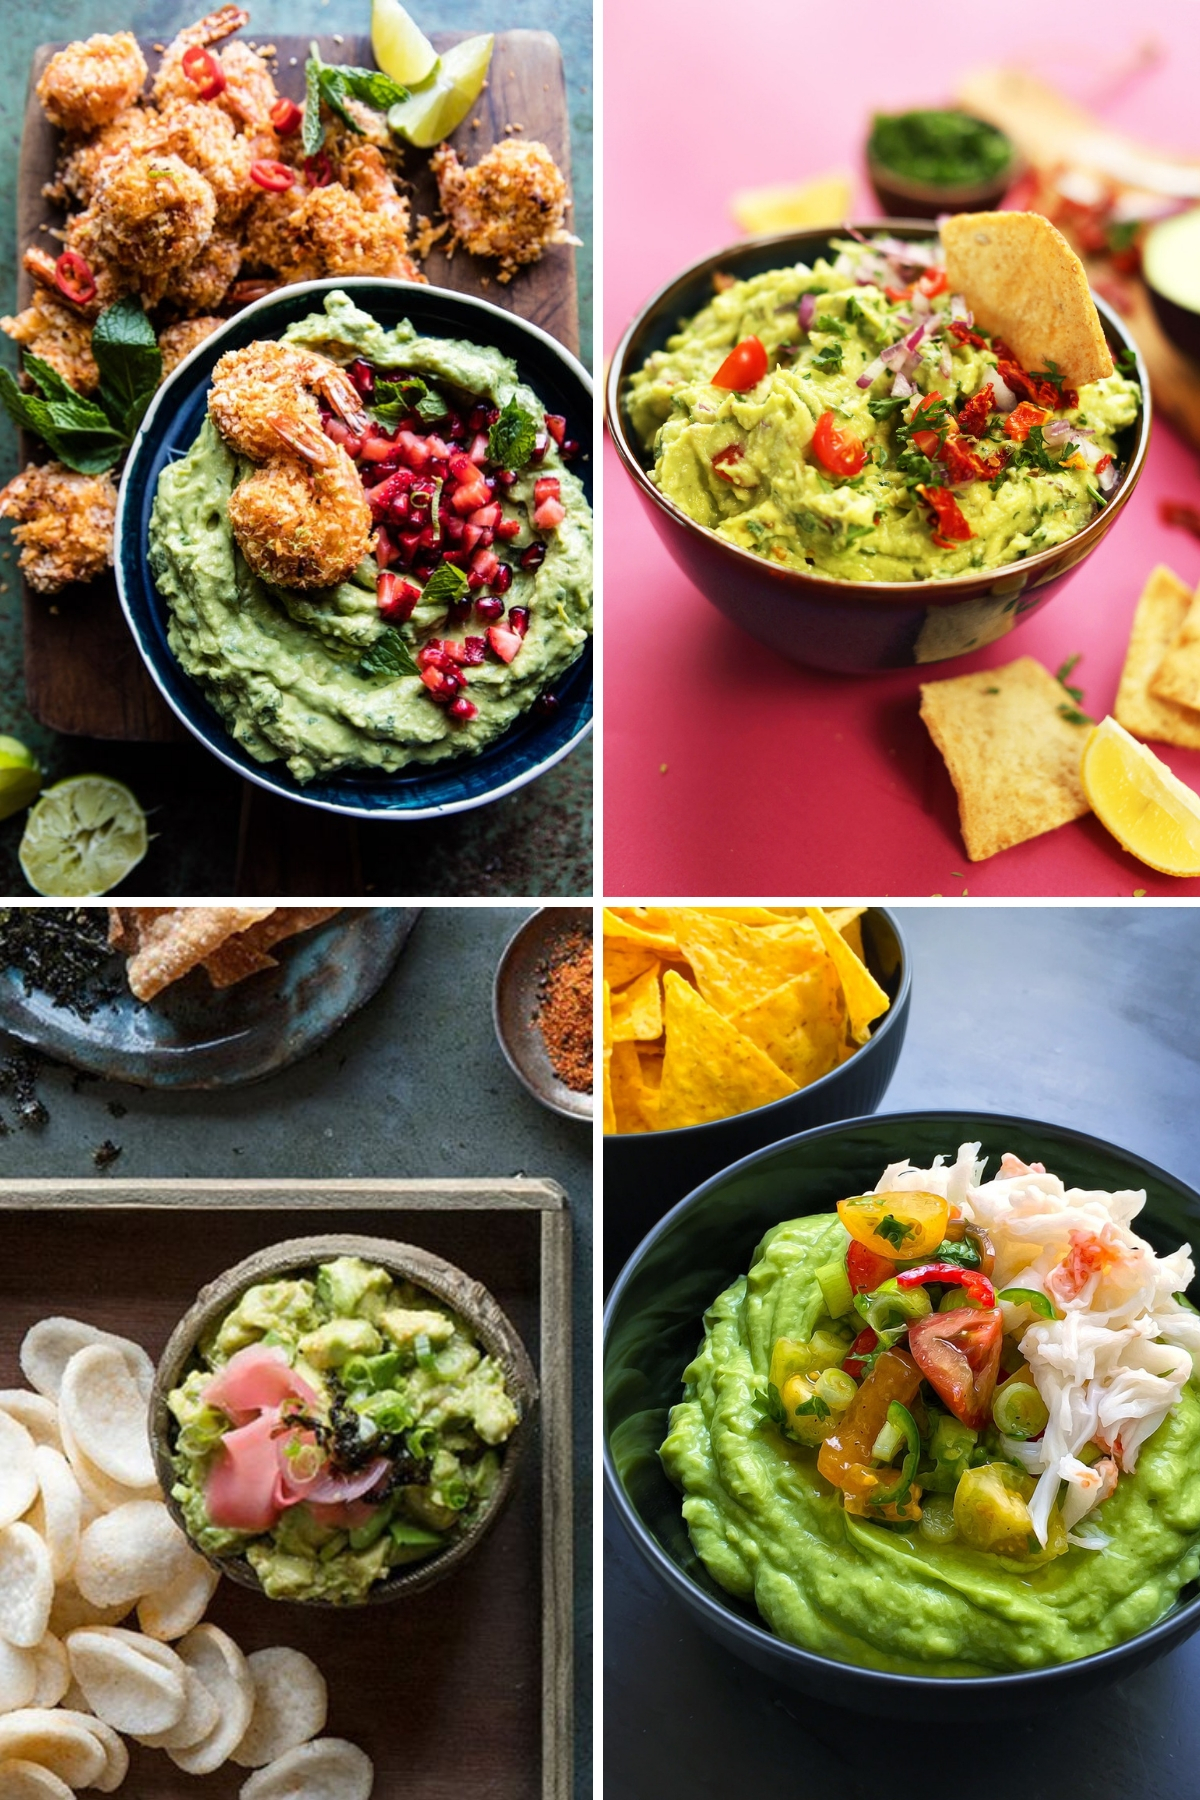 The Ultimate Guide to Guacamole ~ International Guacamole recipes